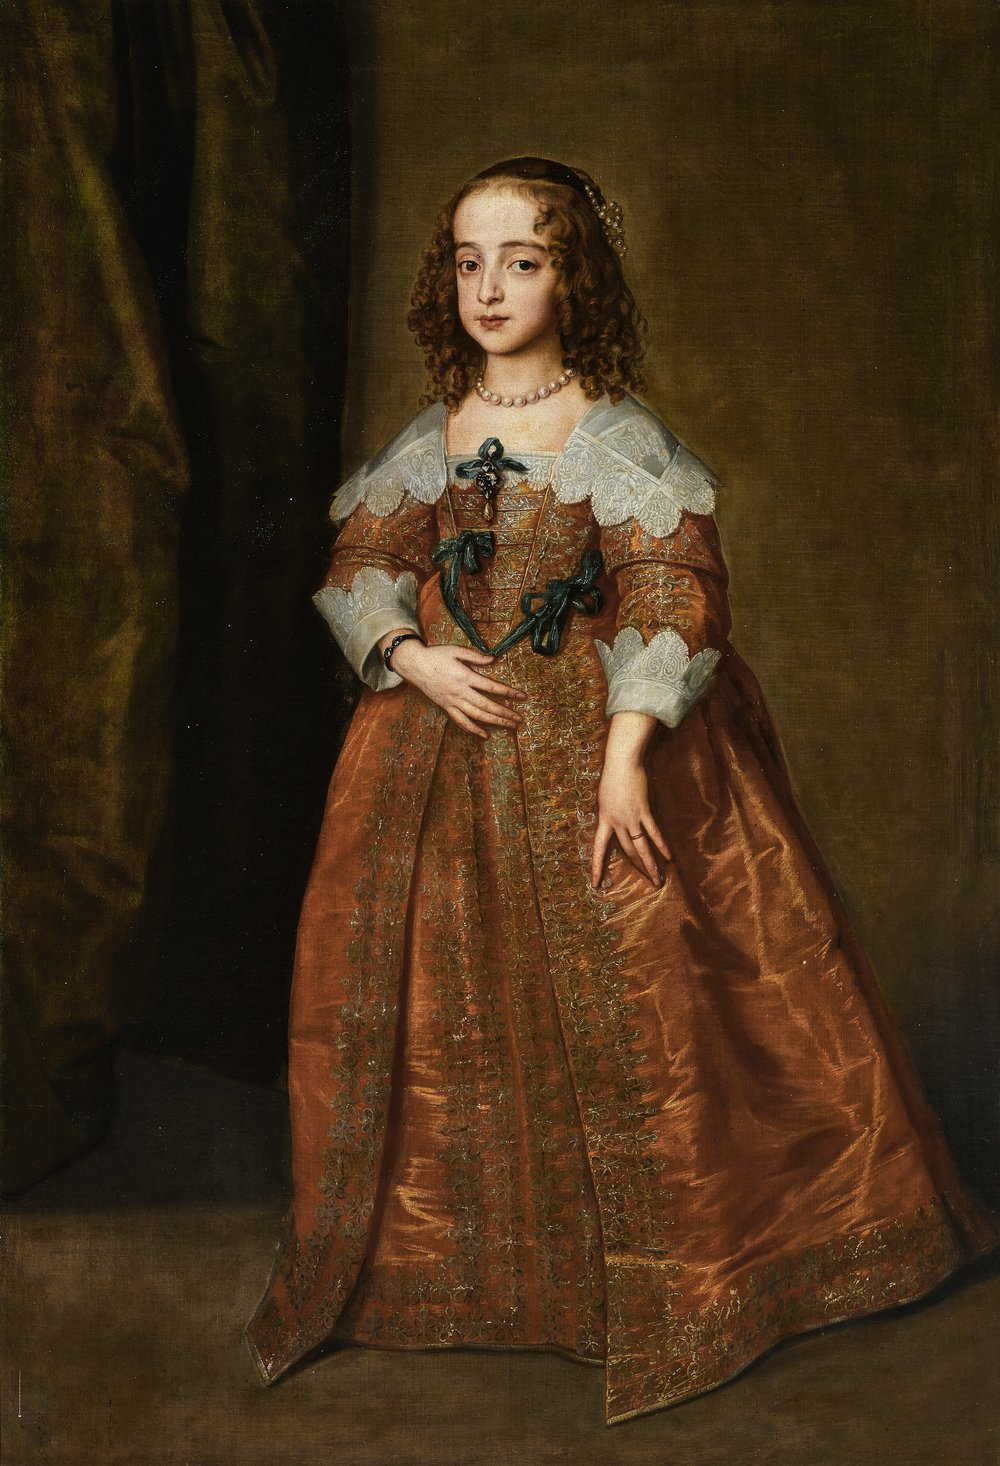 Van Dyck Portrait of Mary, Princess Royal and Princess of Orange: £600,000 - 800,000